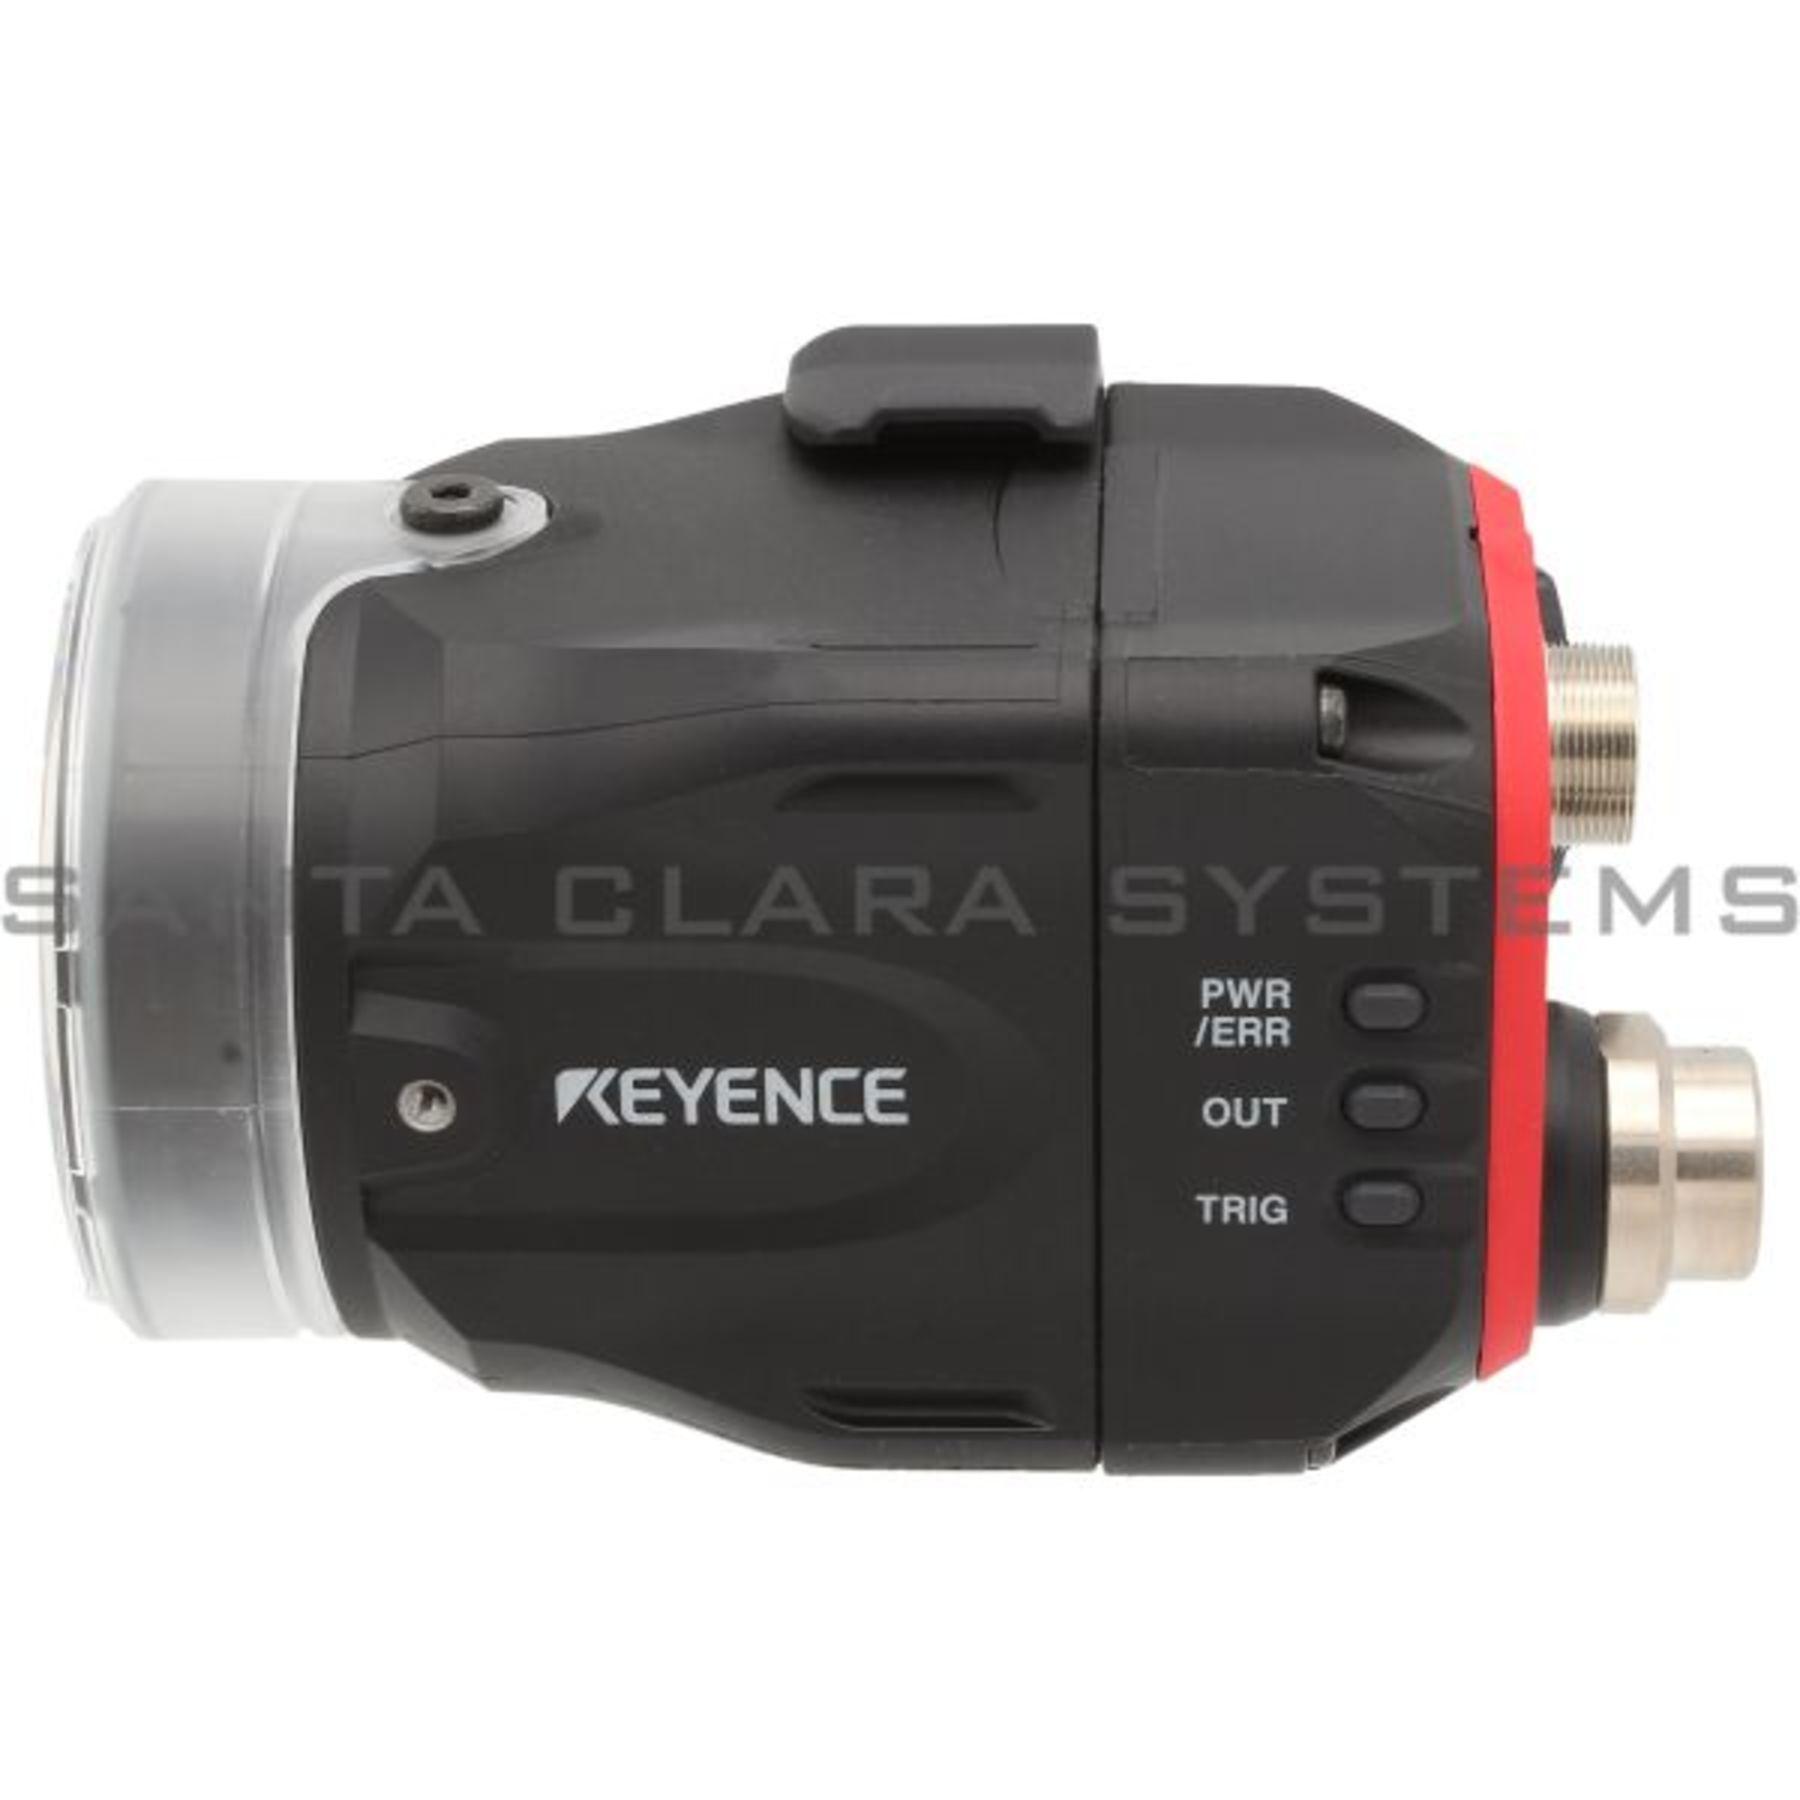 Keyence Vision Sensor Head IV-500CA En stock  Navires